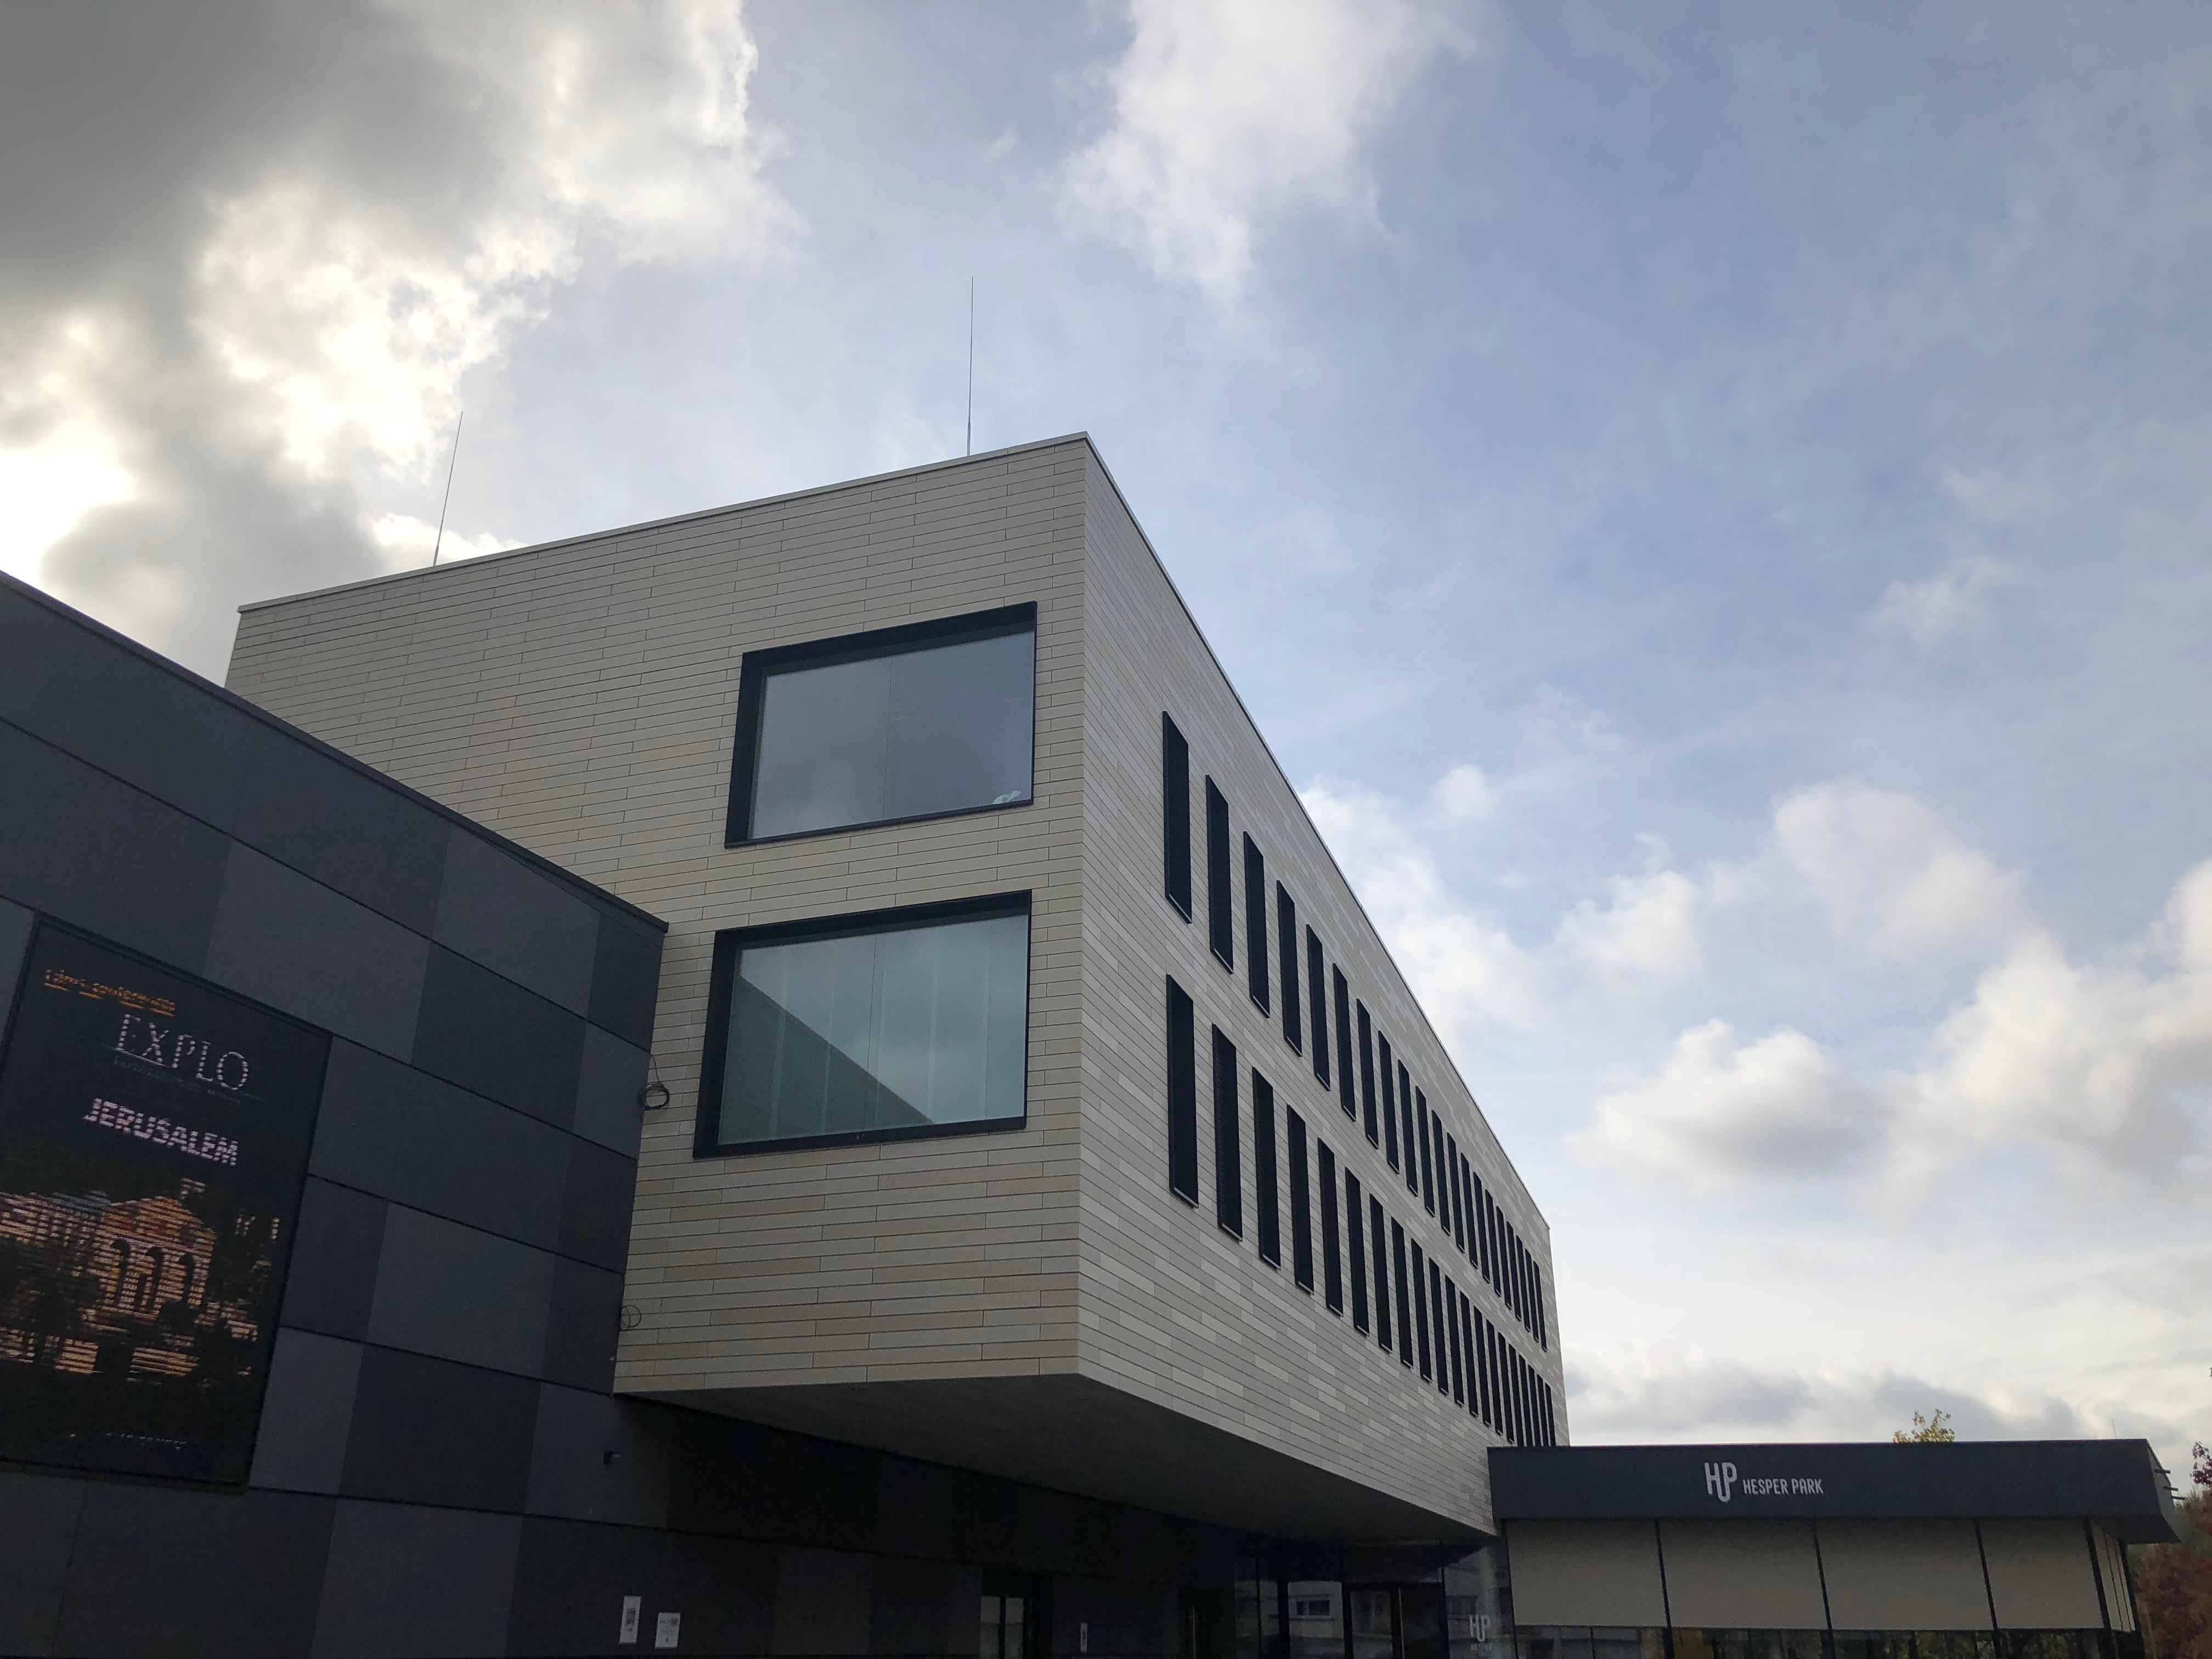 Centre Médical Hesperange Cardiologue Médecin Généraliste Plus